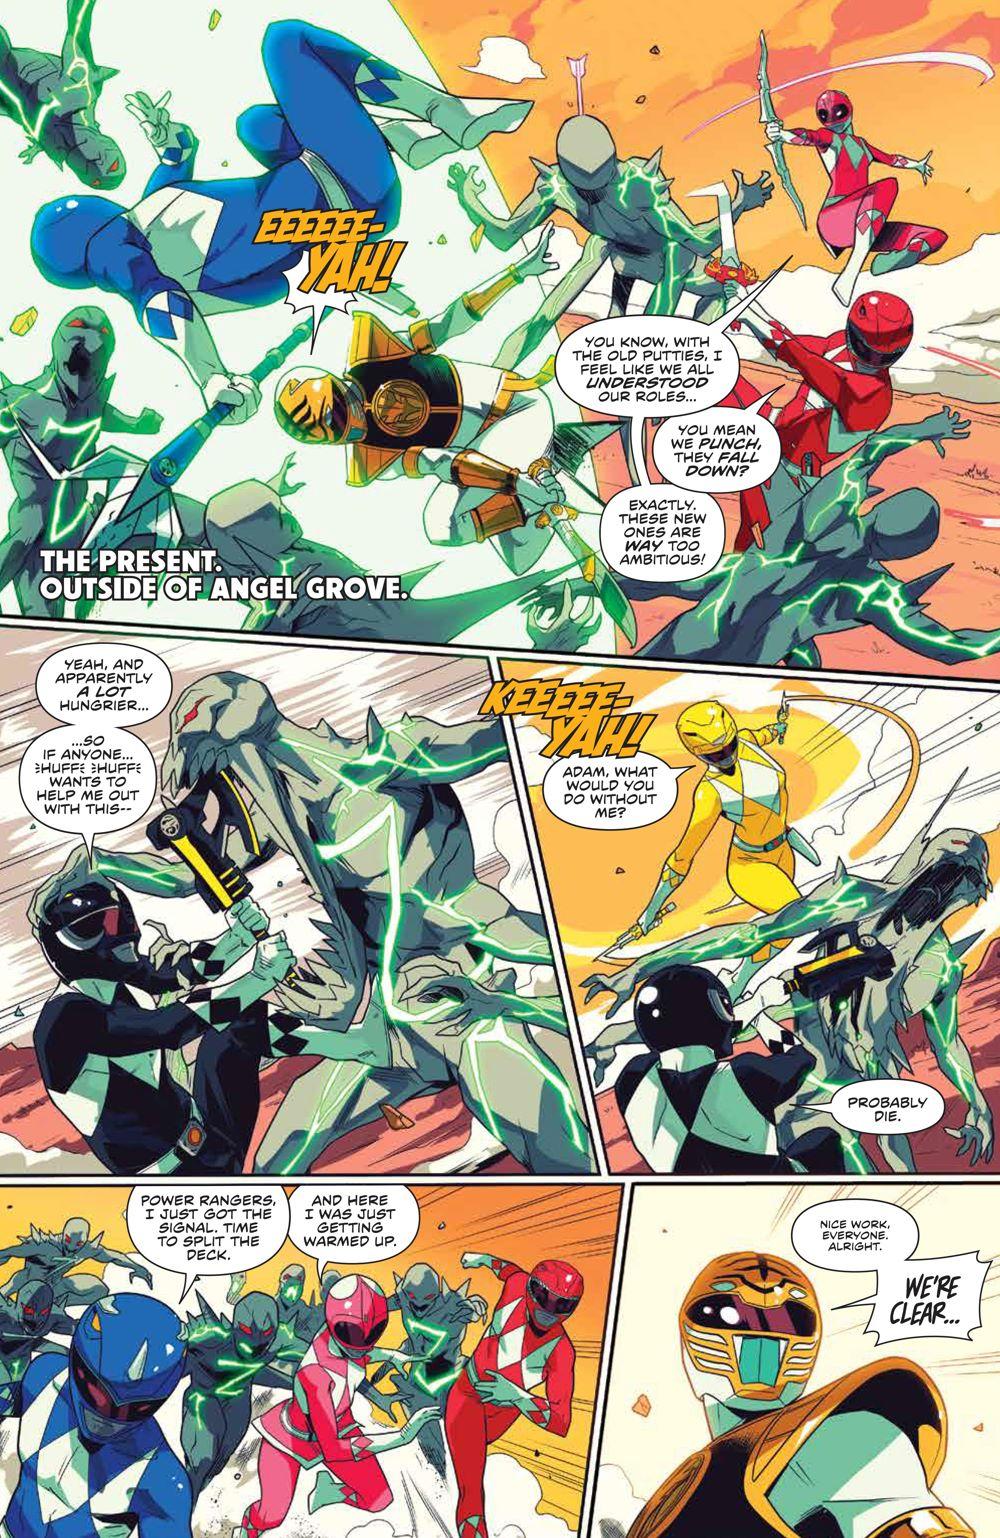 MightyMorphin_006_PRESS_7 ComicList Previews: MIGHTY MORPHIN #6